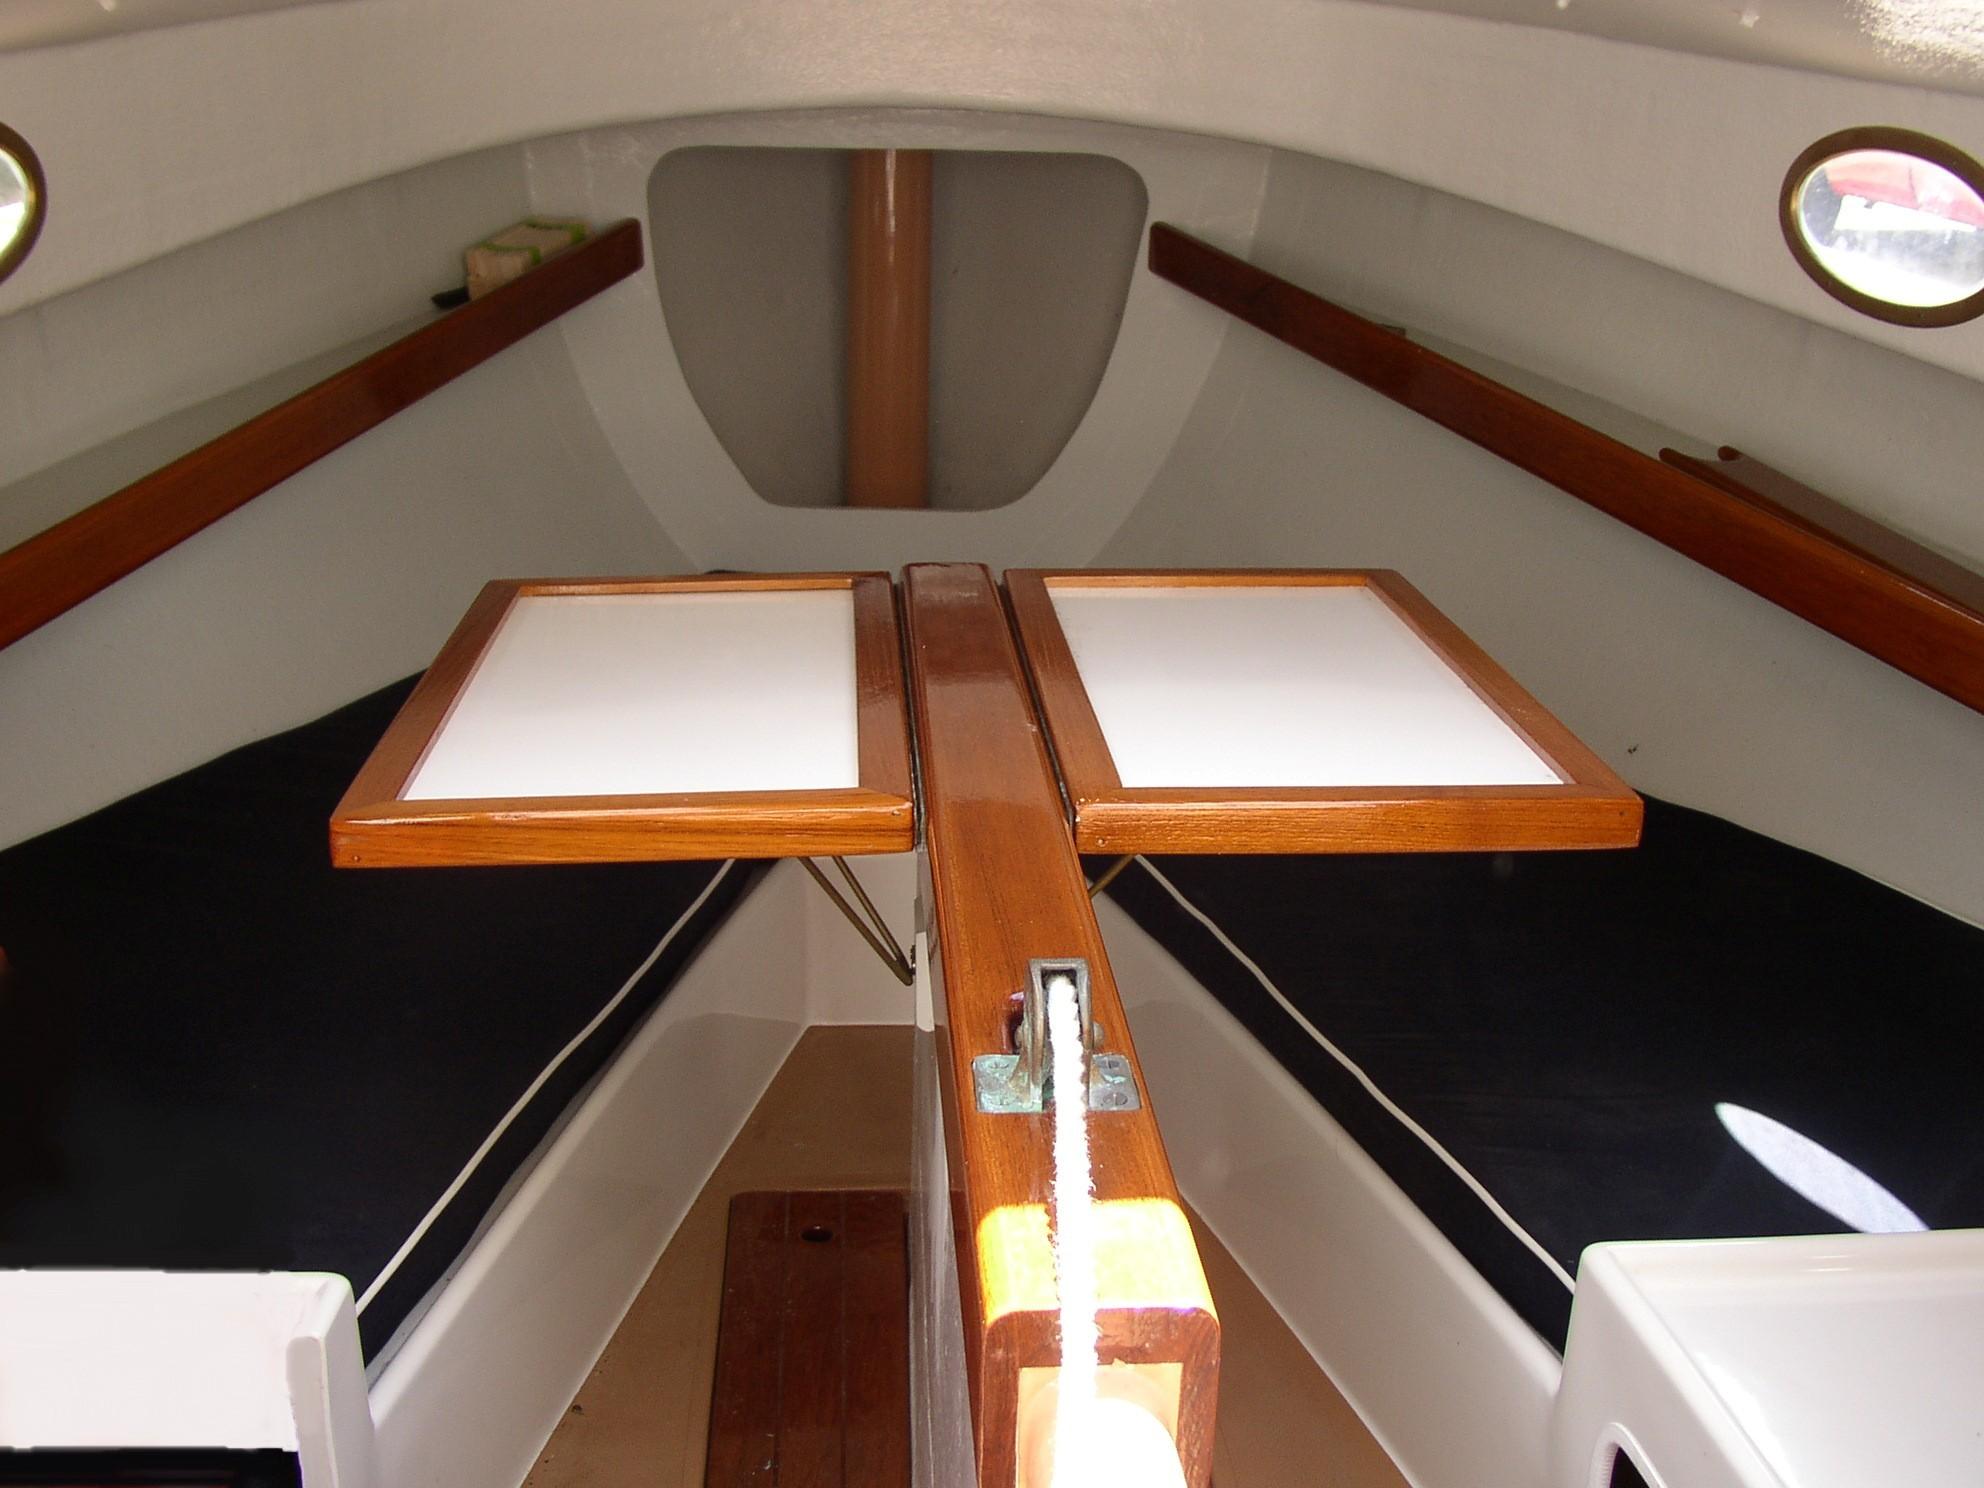 catboats 016.jpg